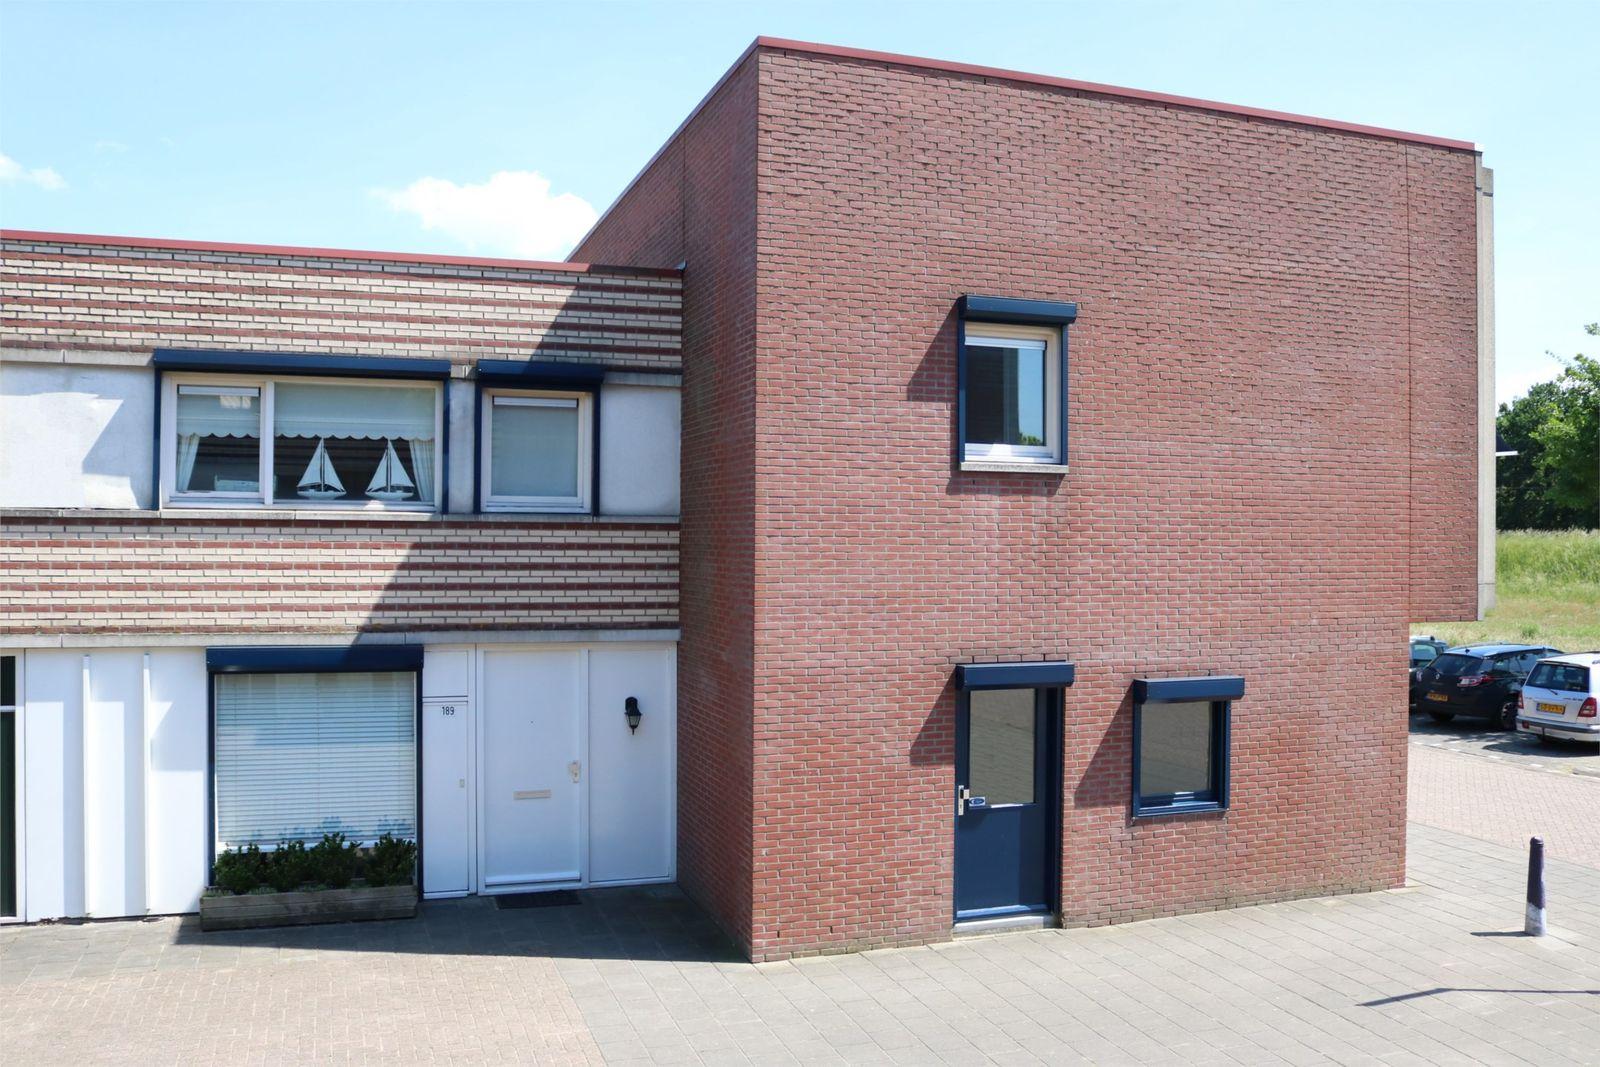 Oegstgeeststraat 189, Tilburg